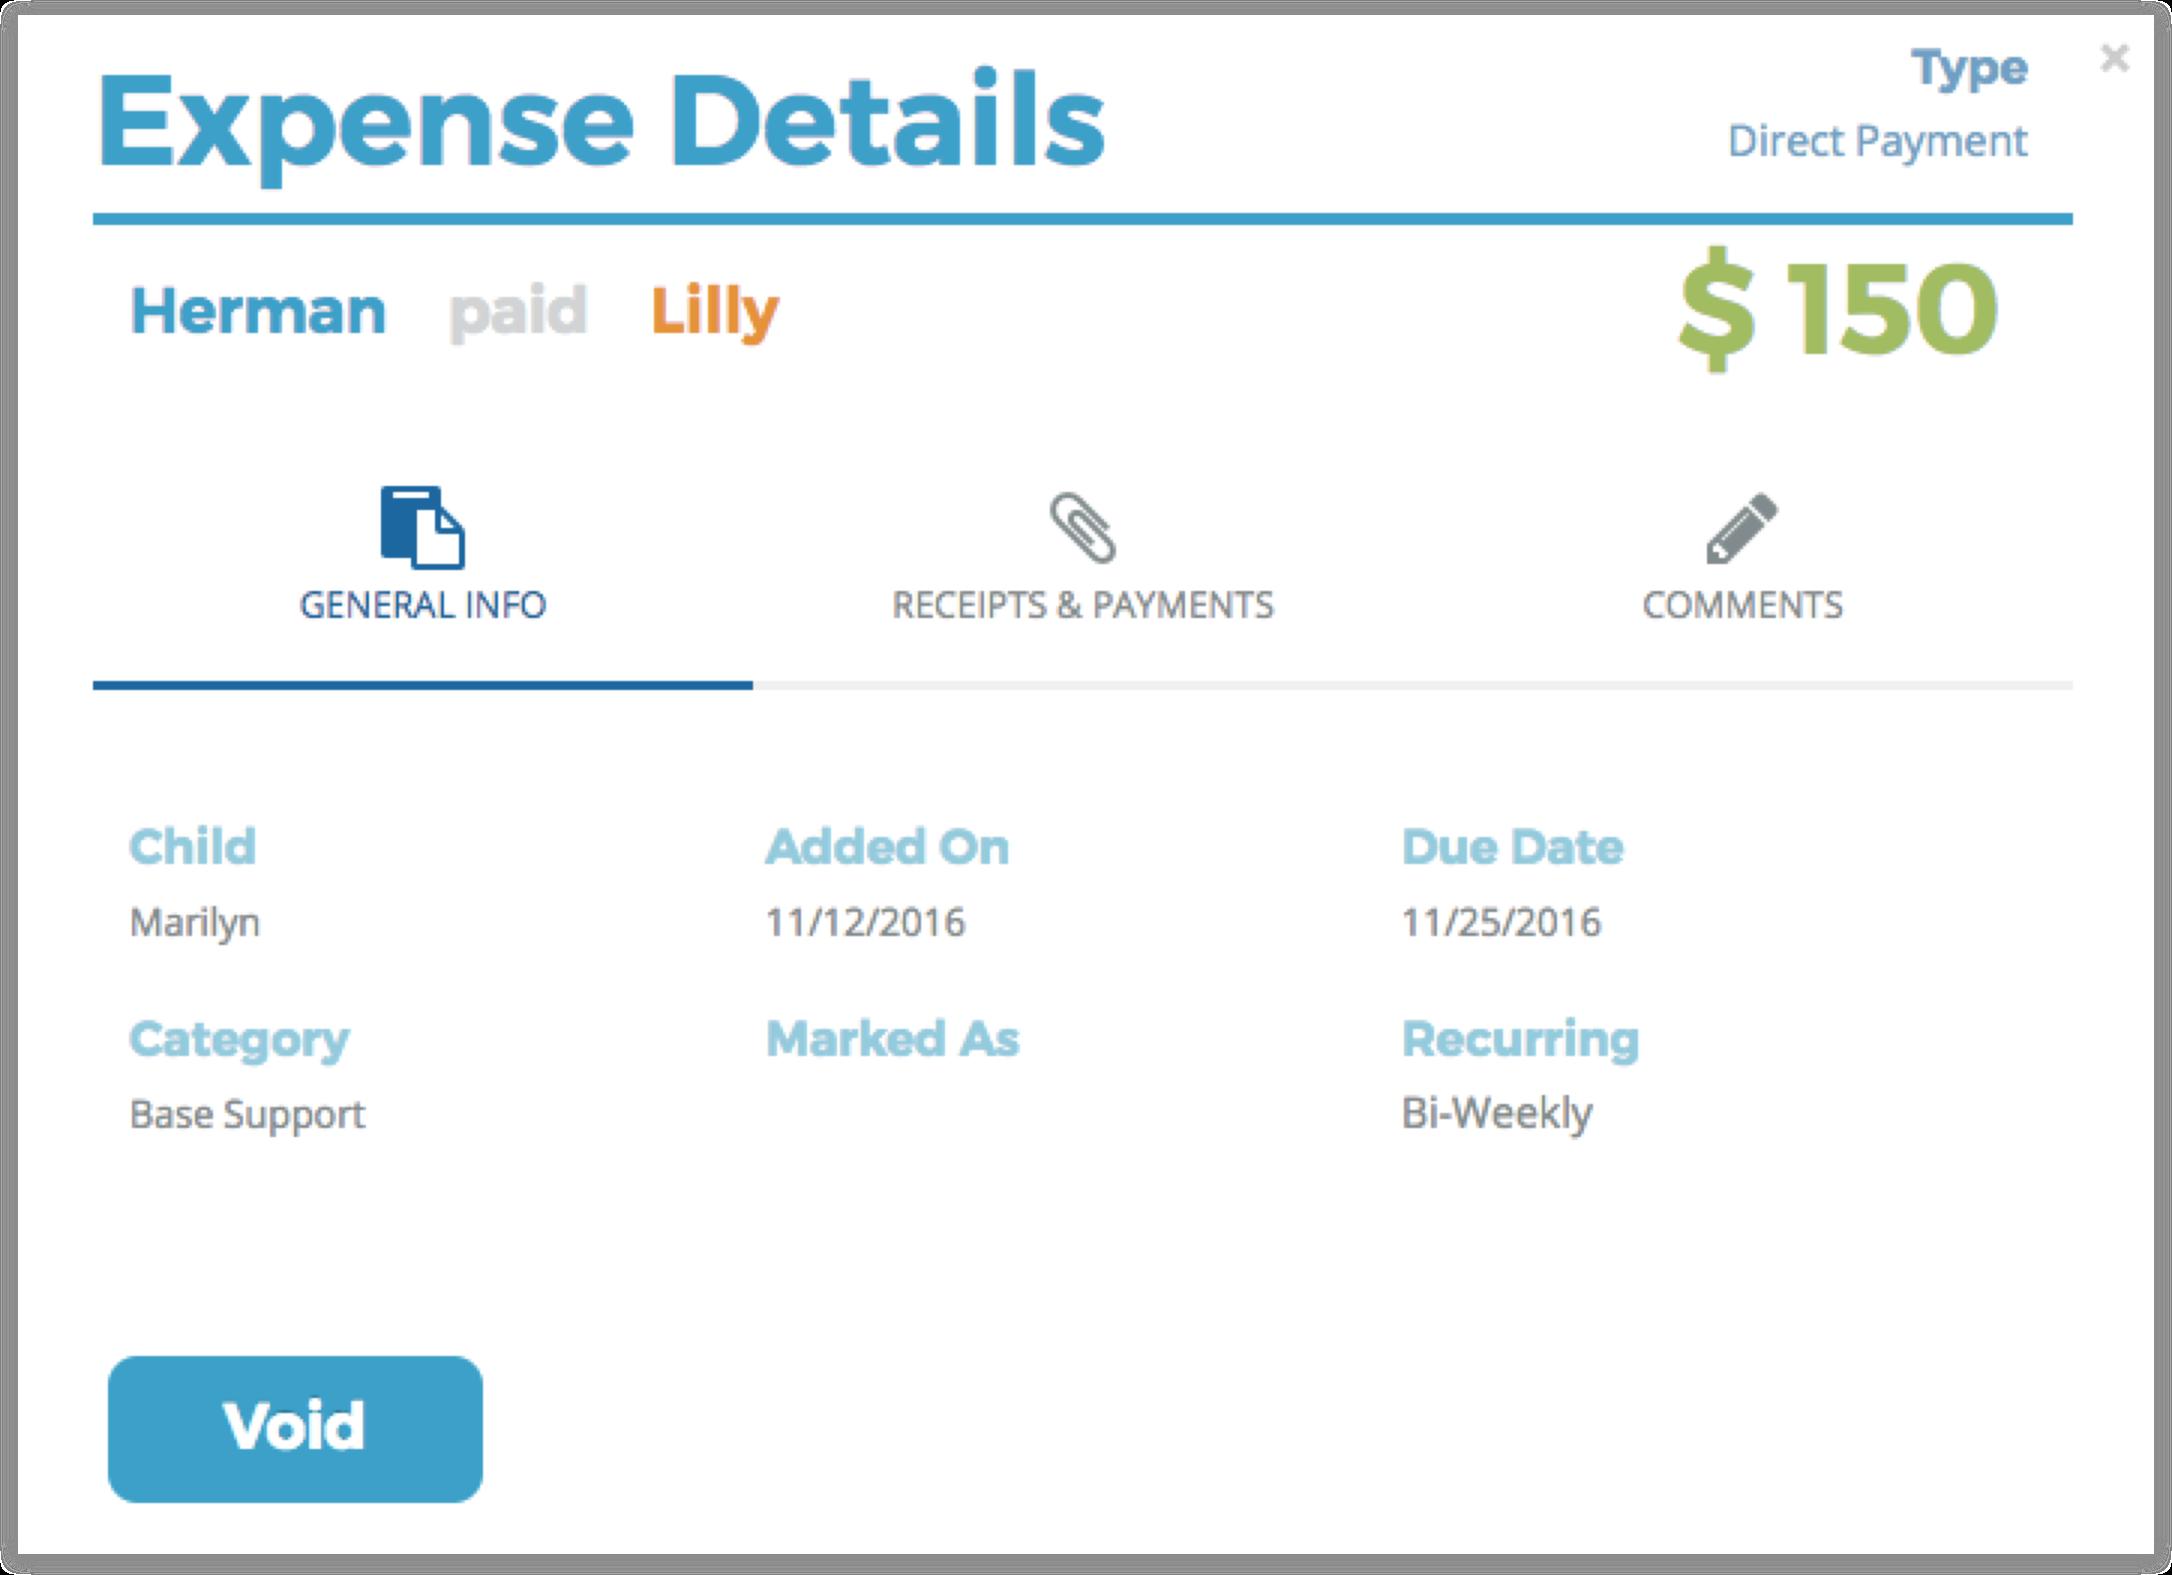 expense-details-1024